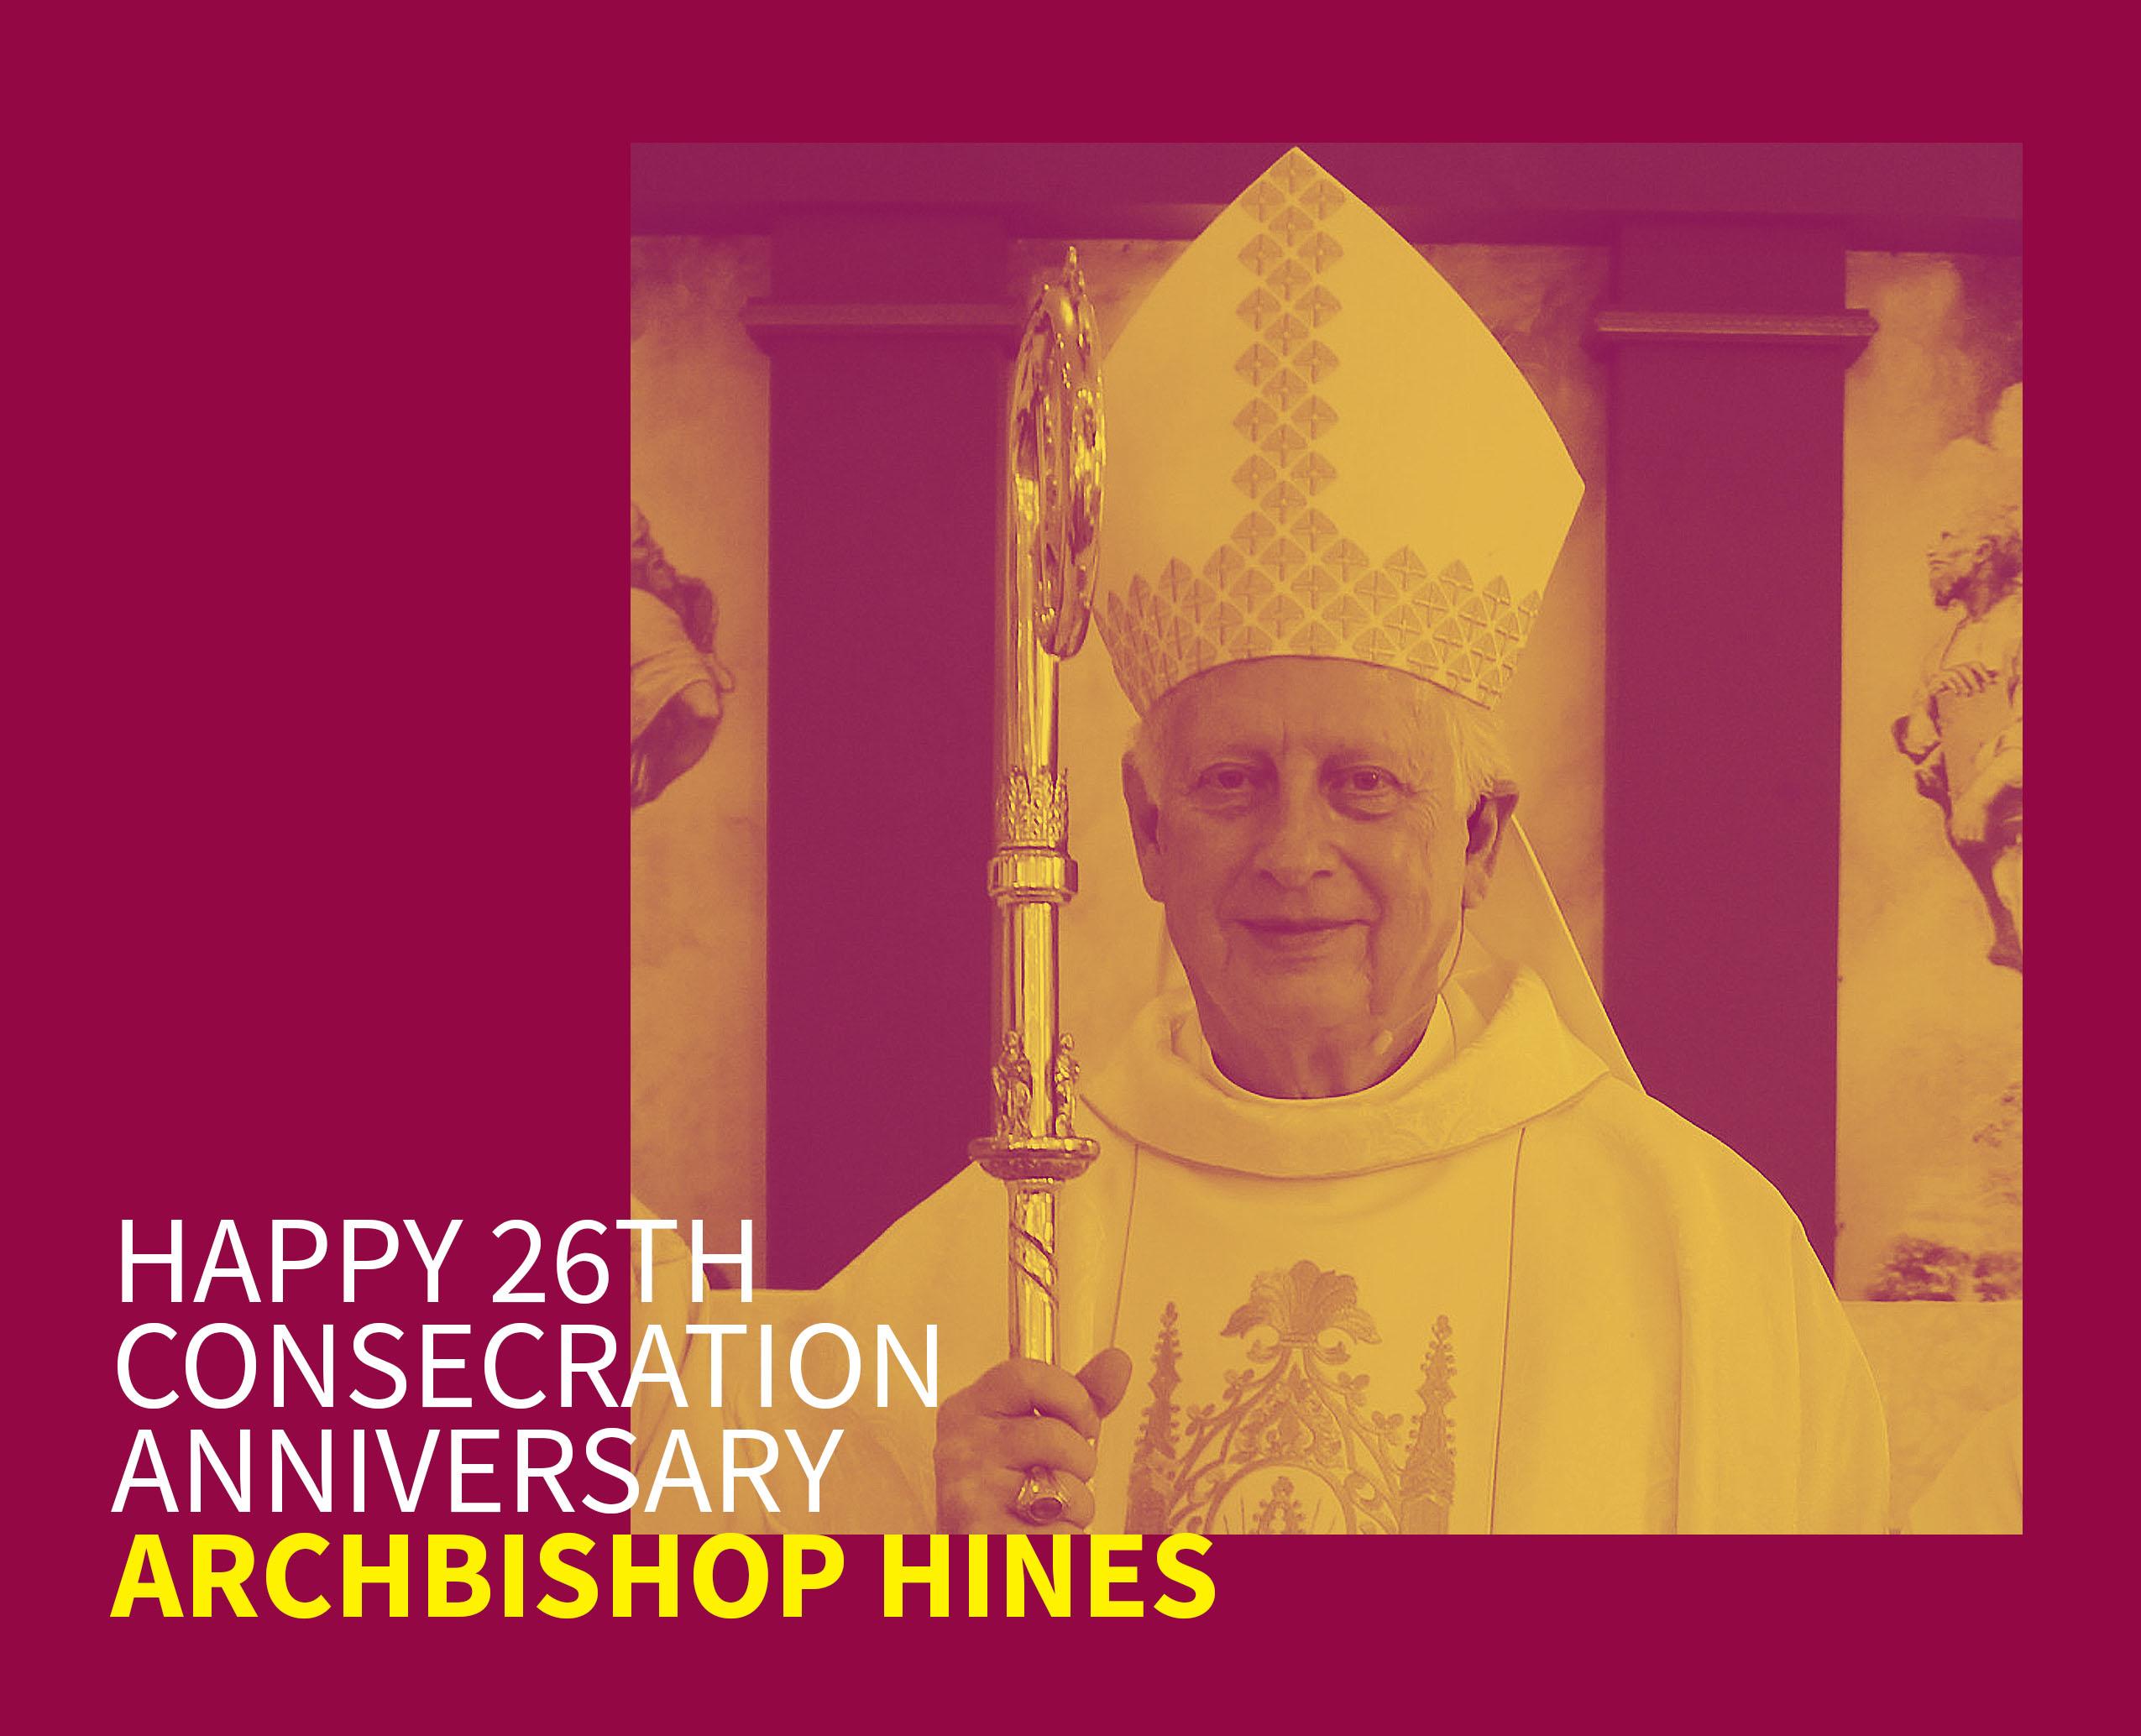 Happy 26th Consecration Anniversary